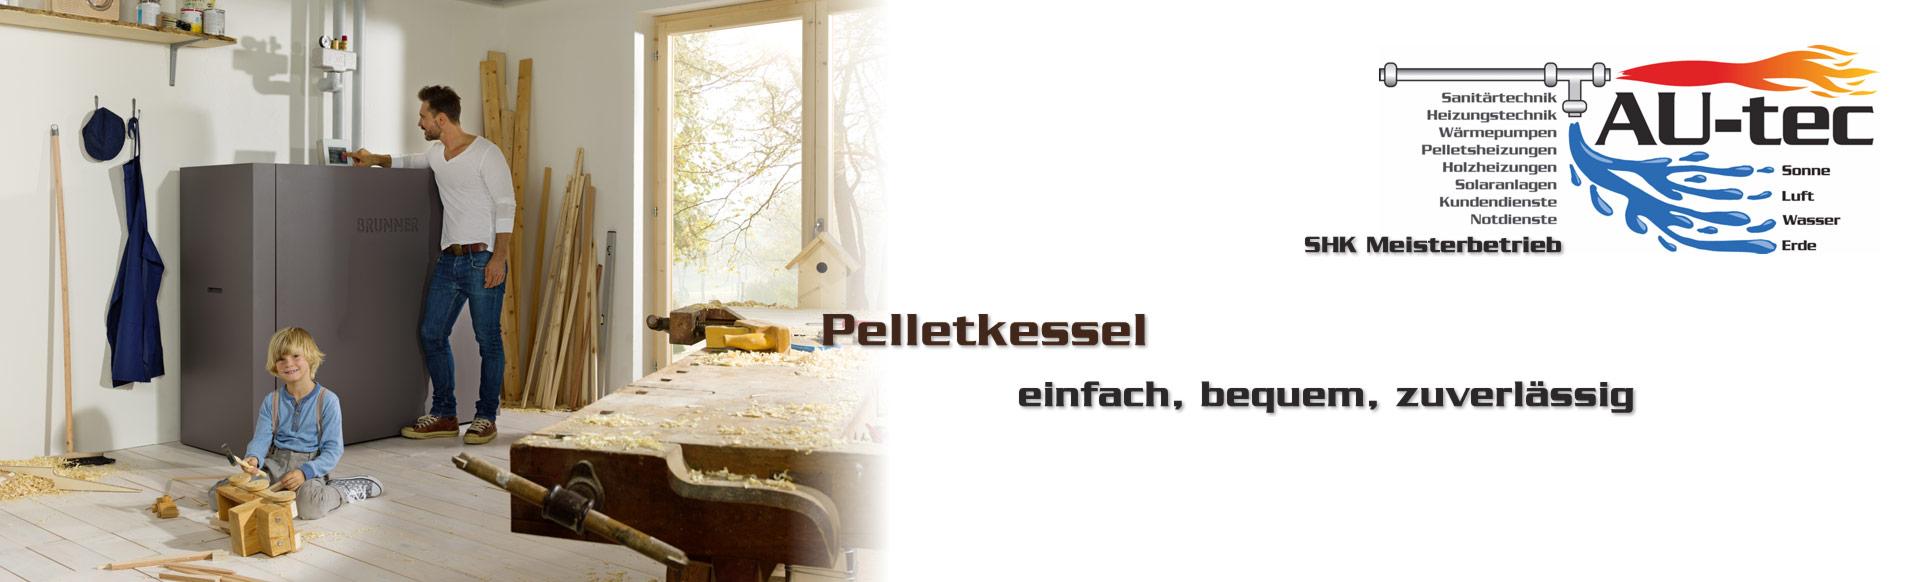 pelletkessel-rastatt-header-autecnet